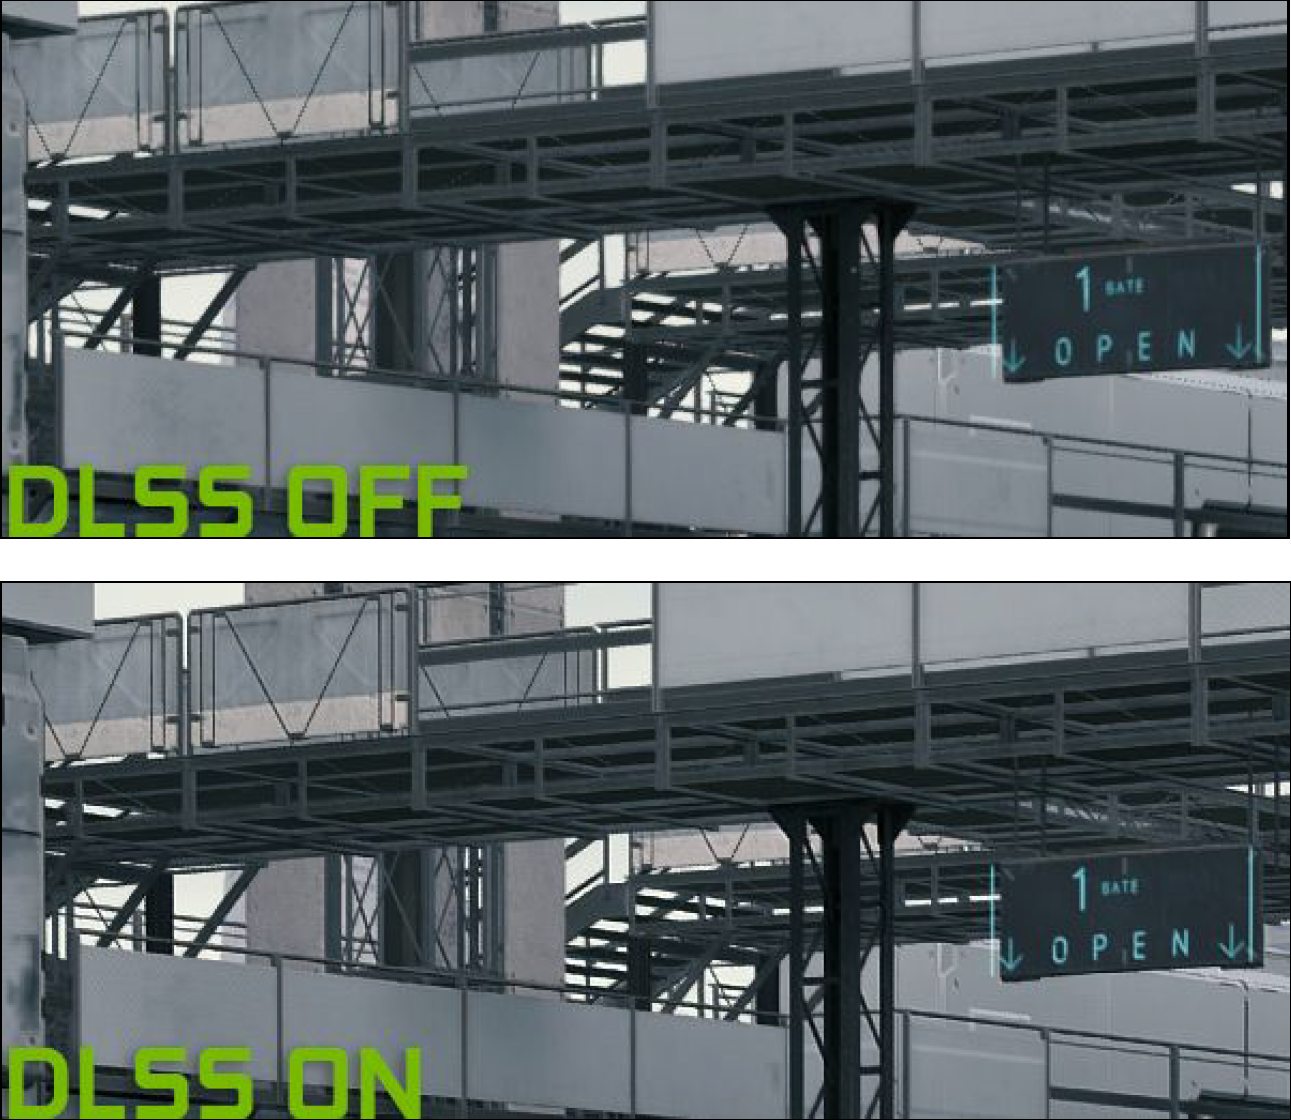 nvidia-geforce-rtx-gpu_death-stranding-pc_4k-1440p-with-dlss-2-0_4